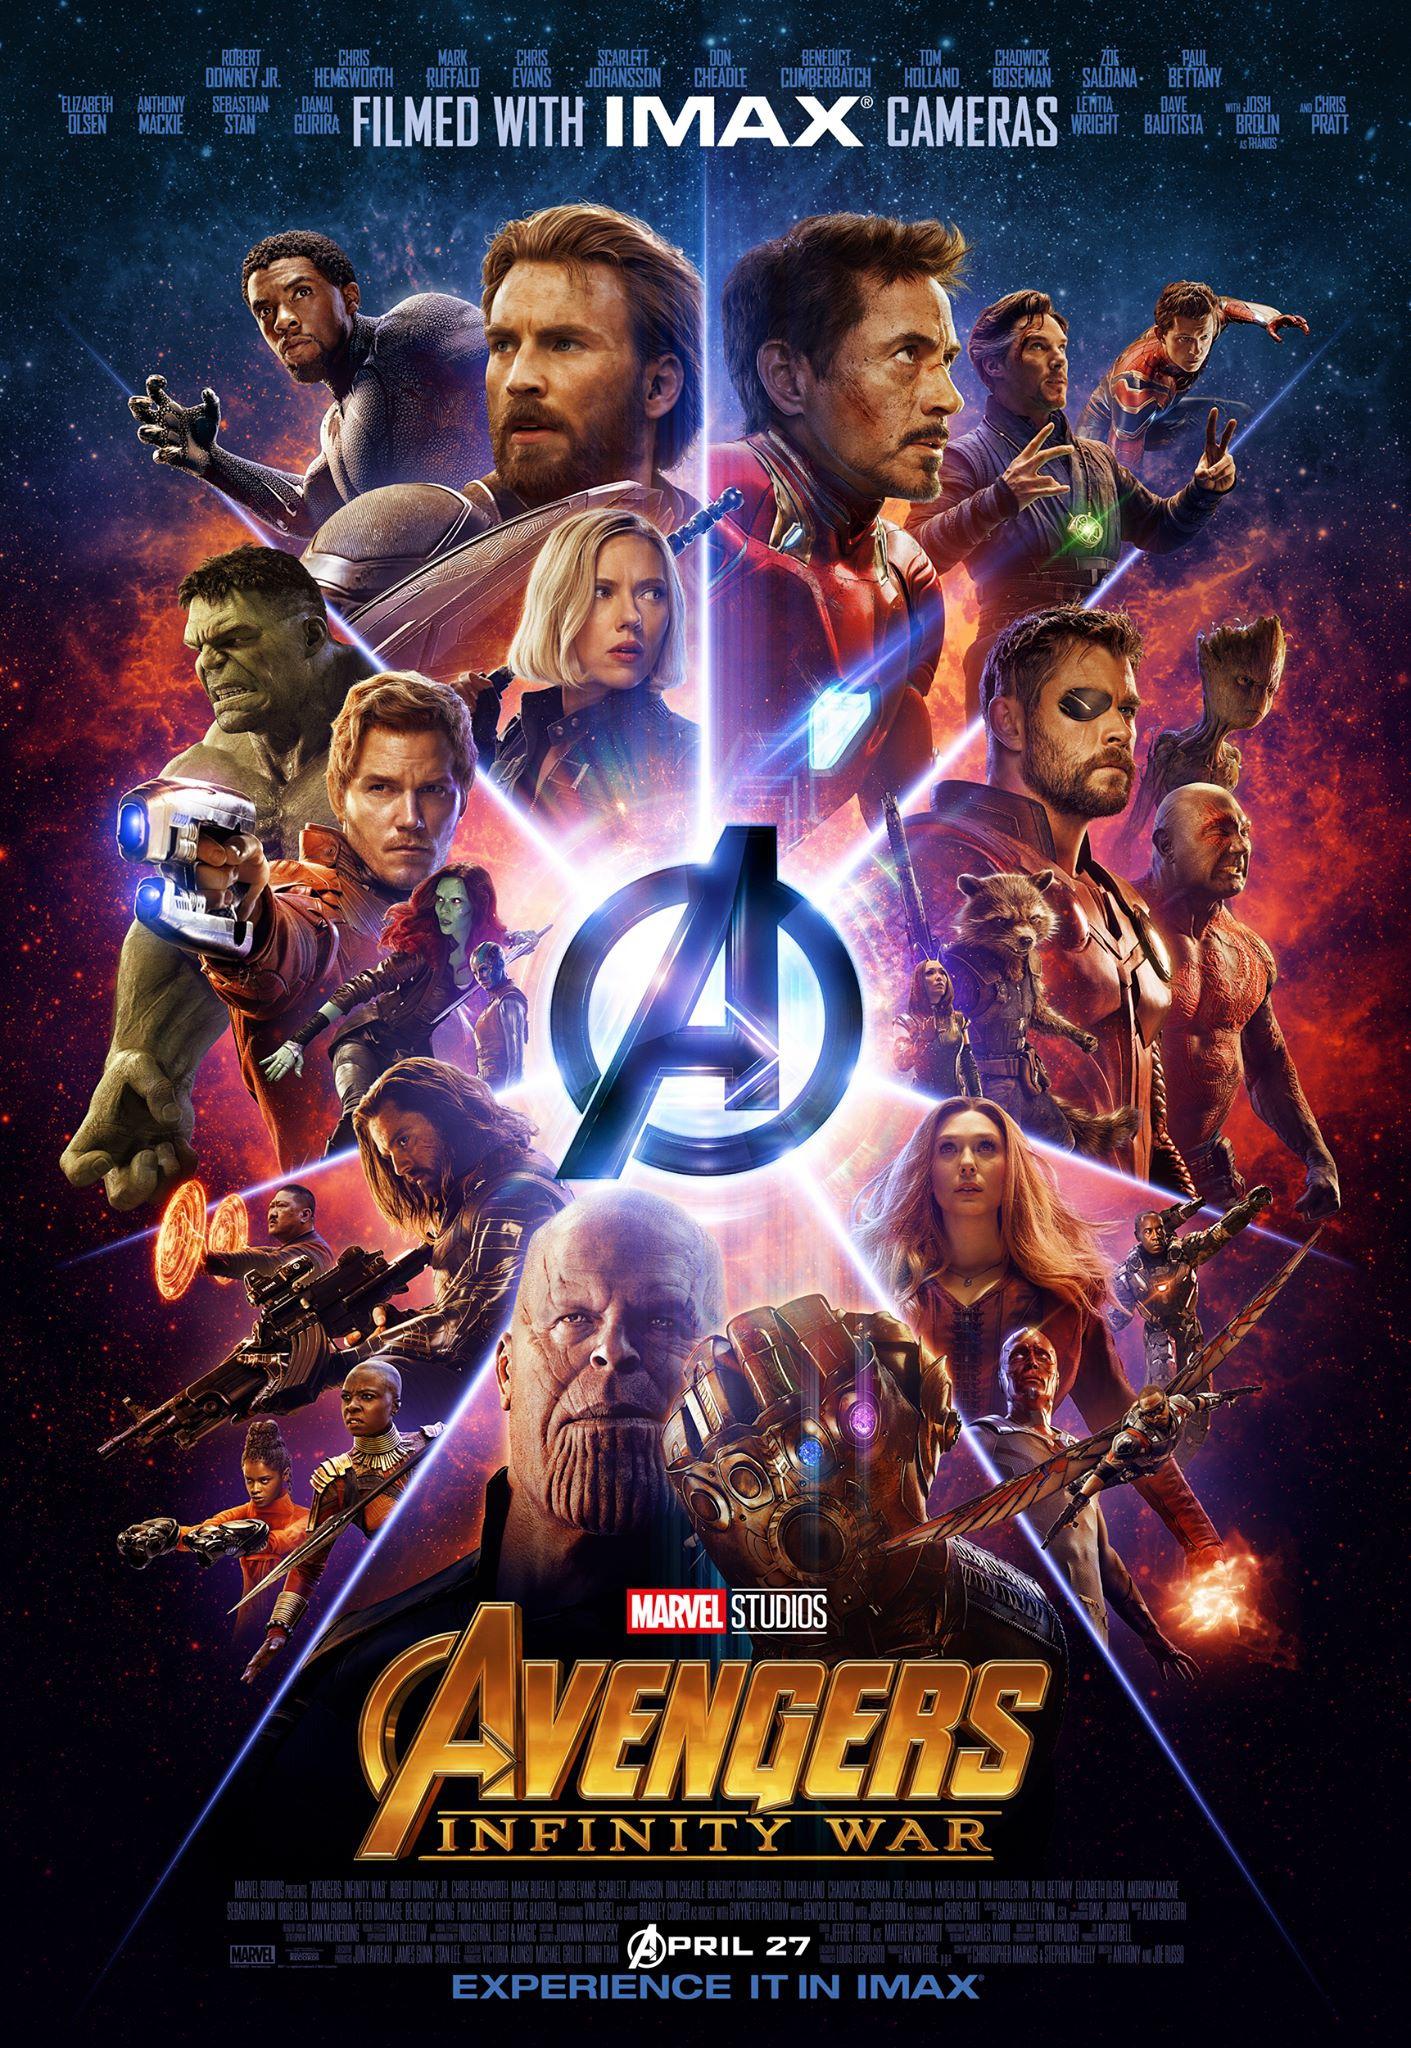 avengers_infinity_war_p8.png